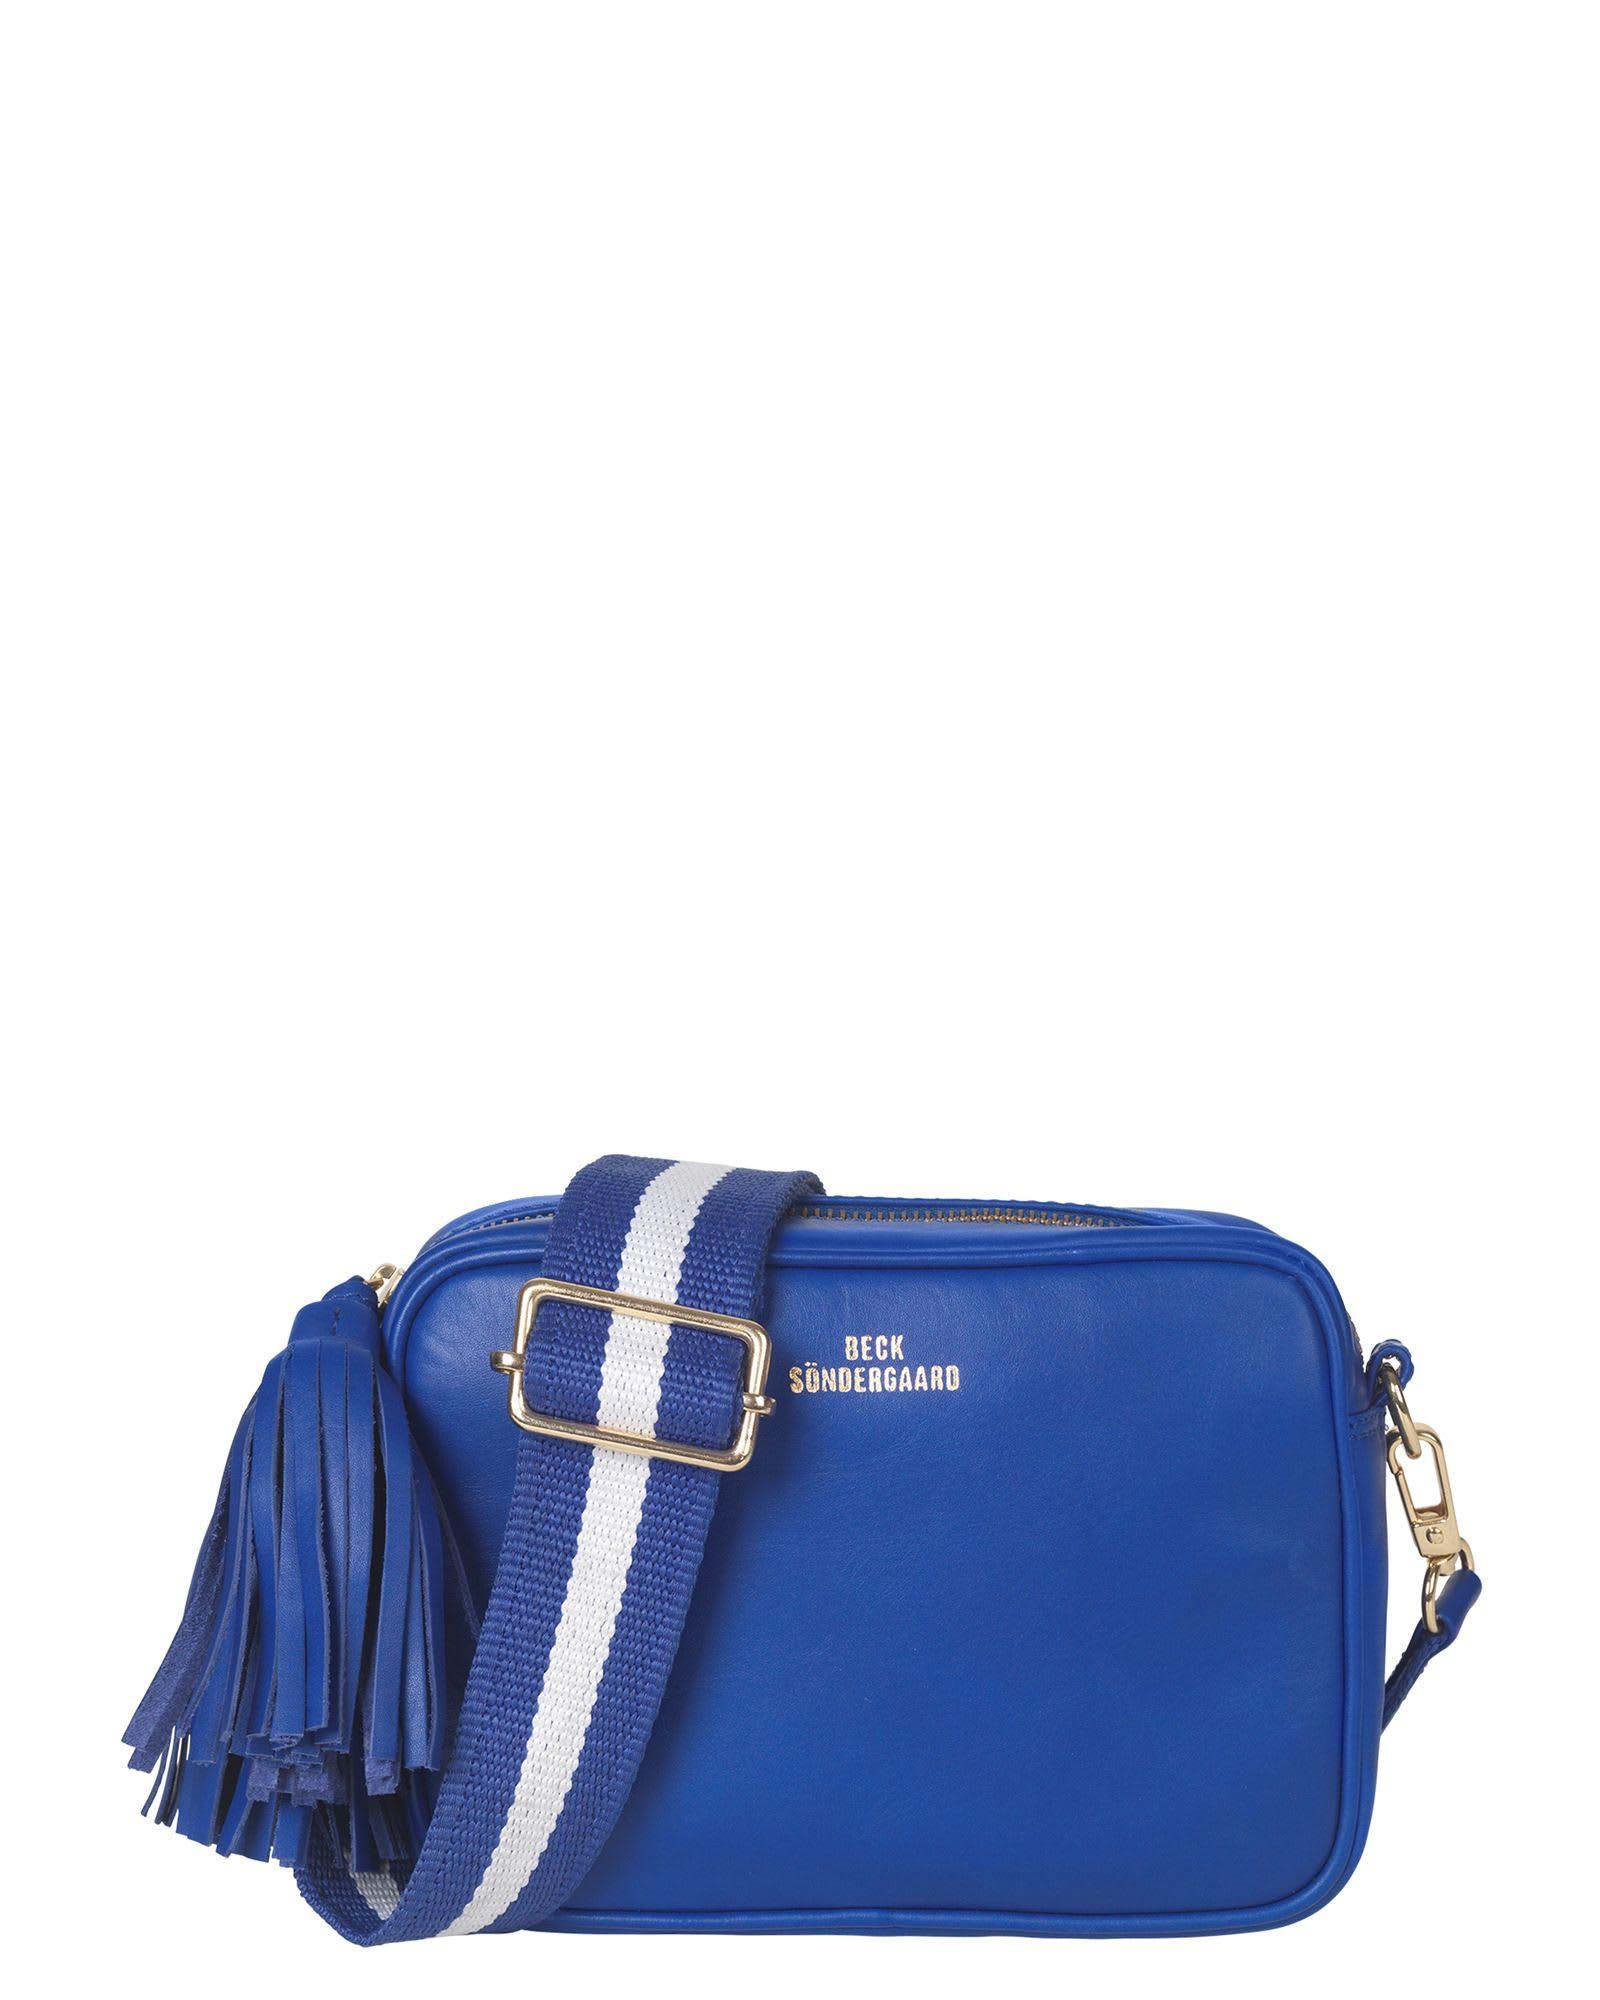 Becksondergaard Blue Lullo Rua X Body Bag